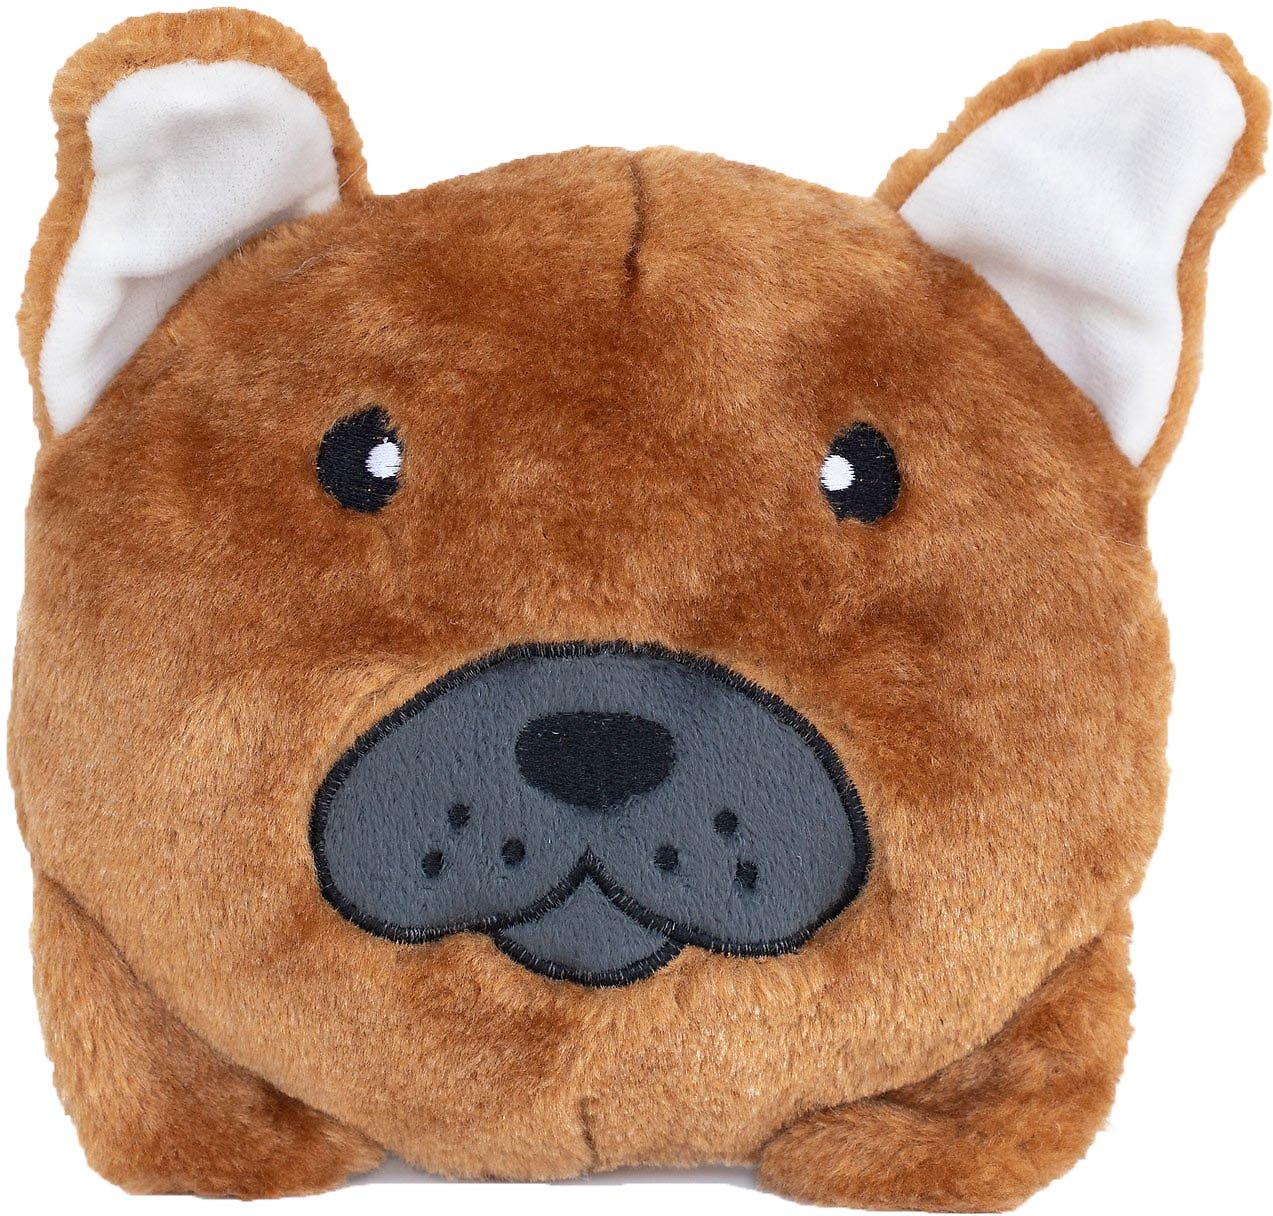 ZippyPaws Squeakie Buns Dog Toy, Bull Dog